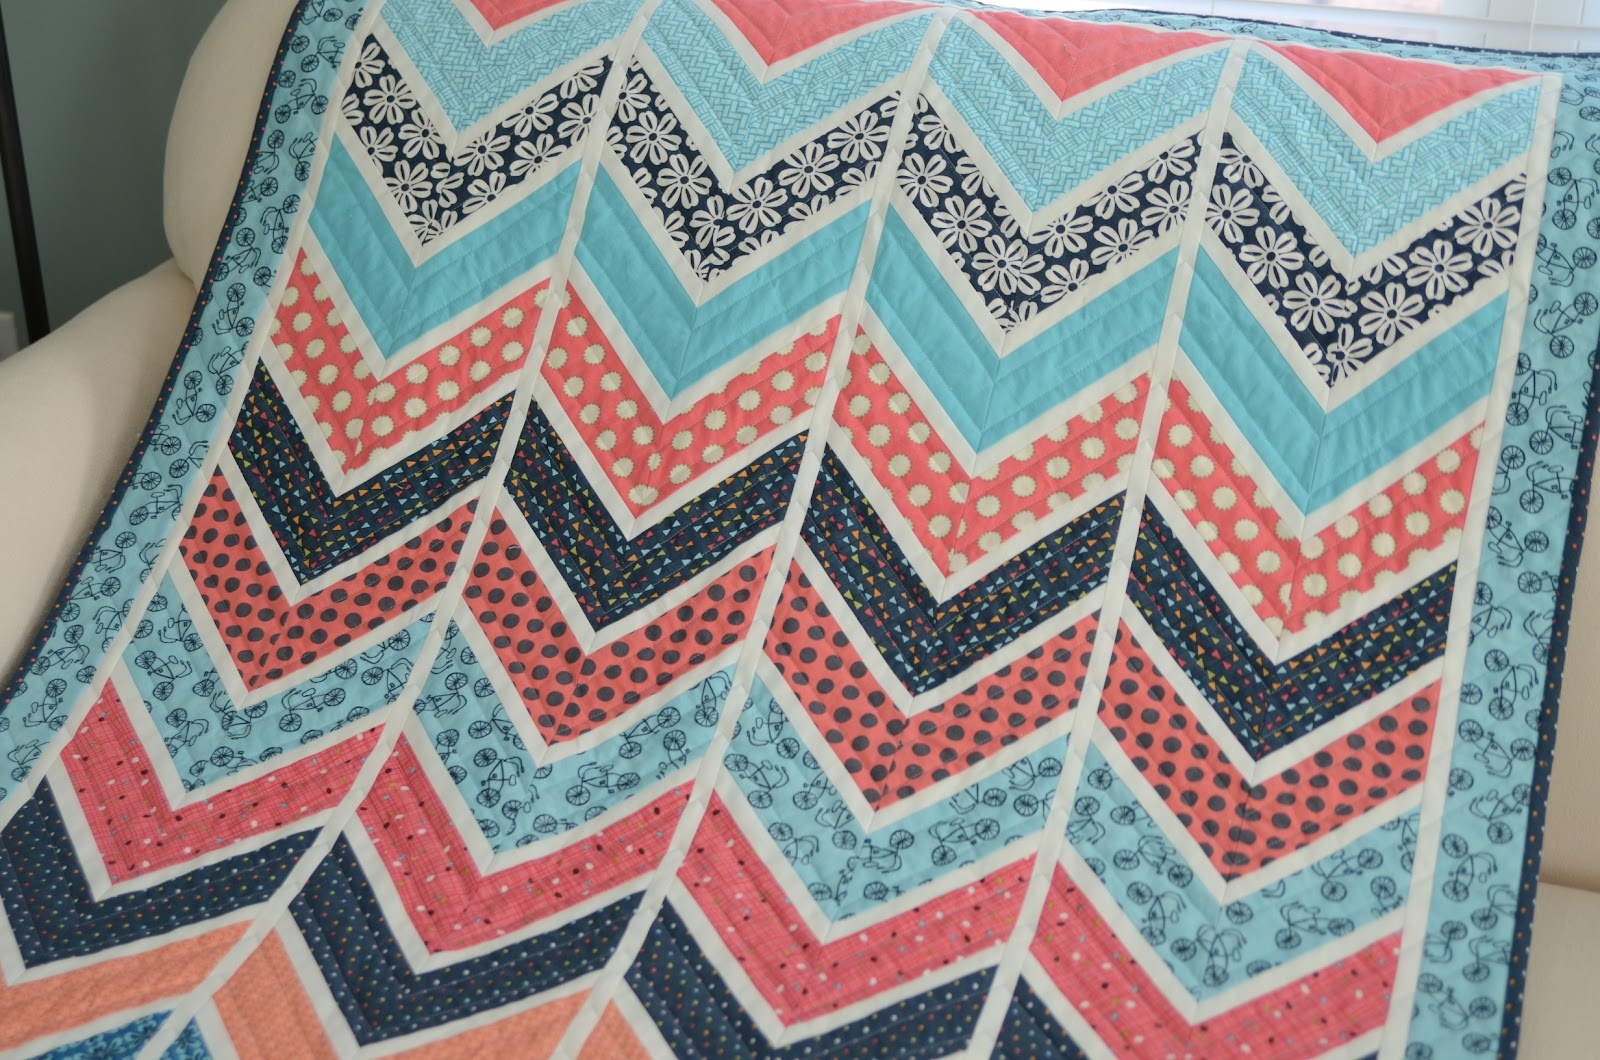 Hyacinth Quilt Designs: Chevron - Part 1